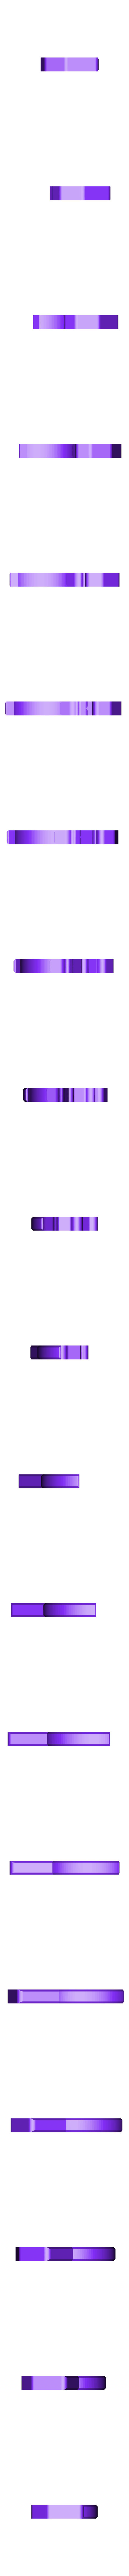 GRENADE_V4_SPOON.stl Download free STL file How it works (Training Grenade) • 3D print model, MuSSy